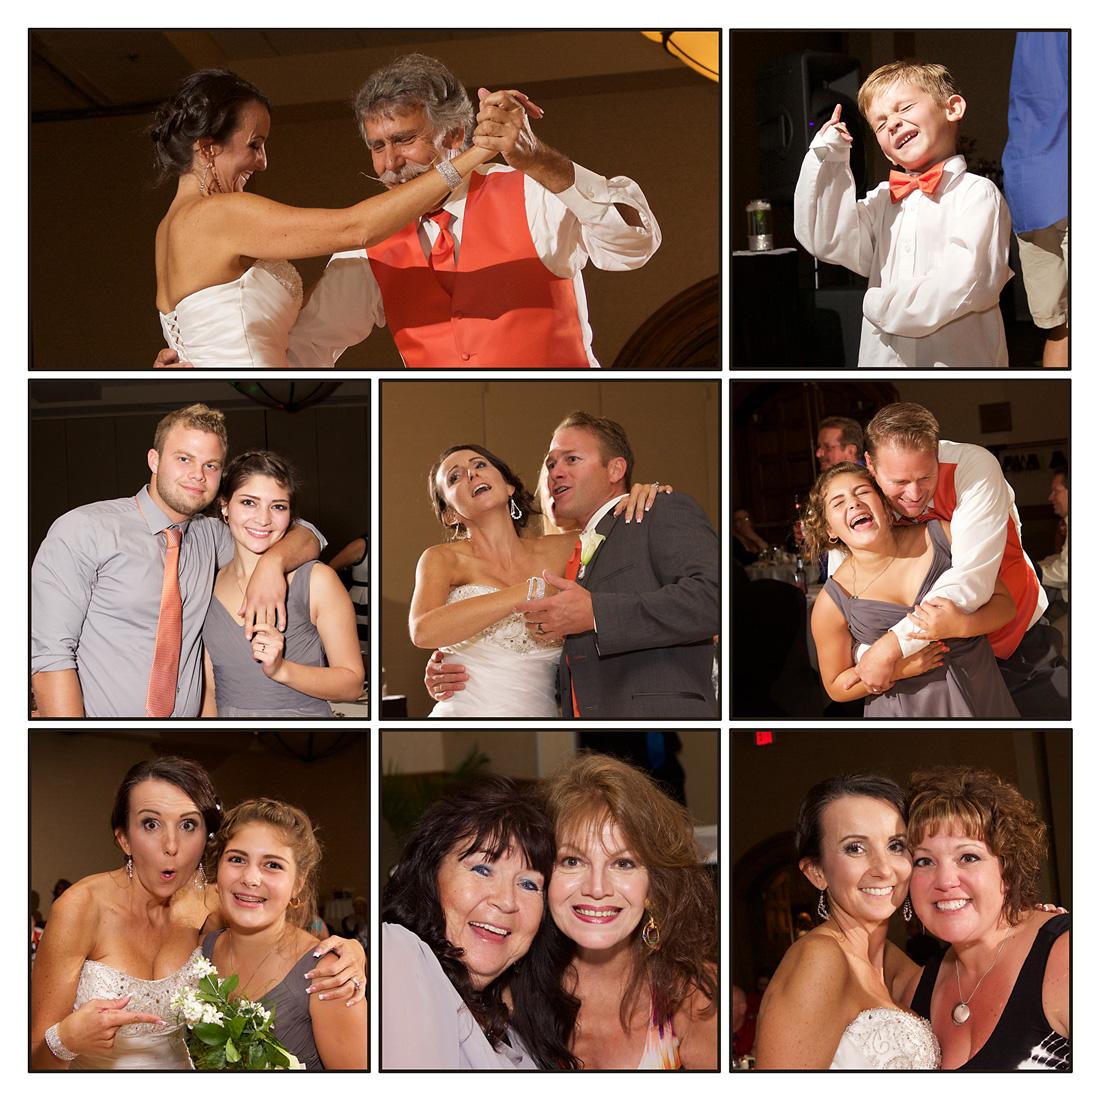 wedding reception photographs from Boise Wedding